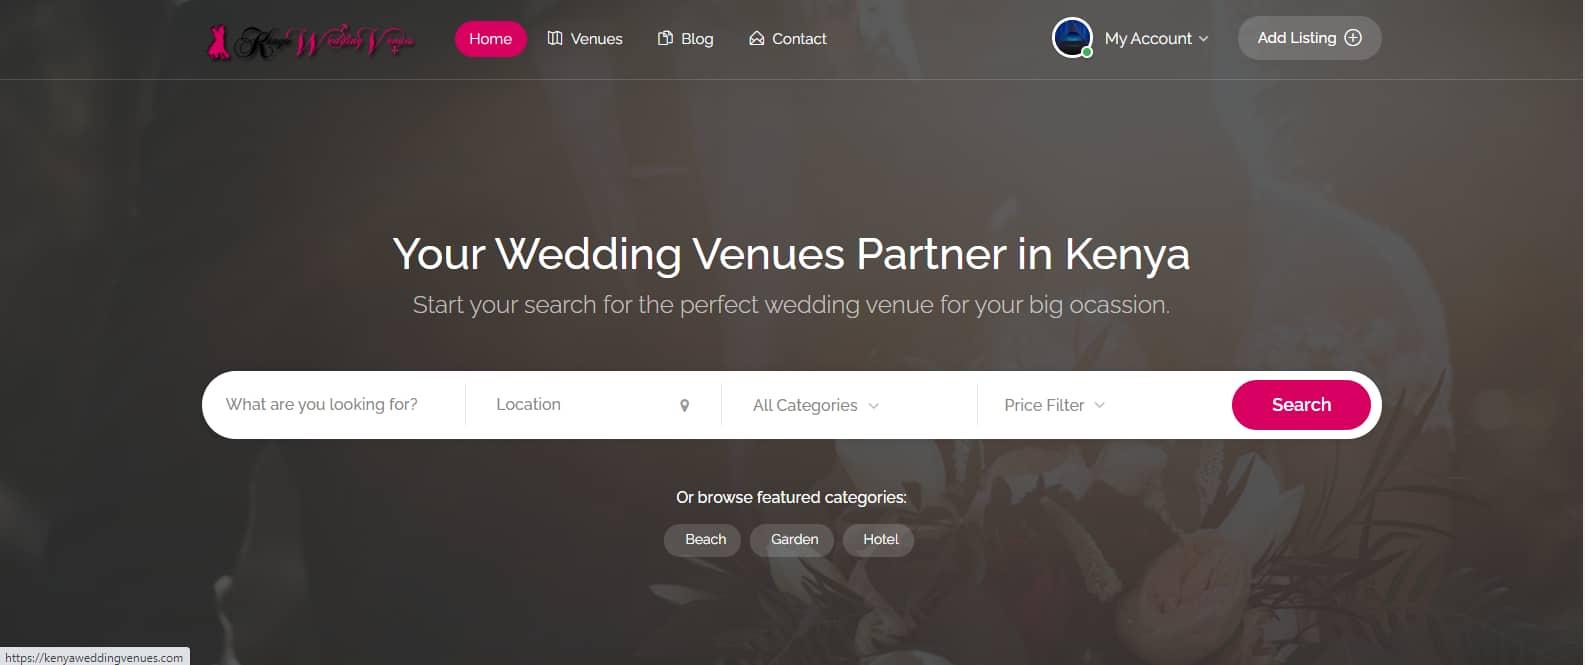 Digital Marketing Project - Kenya Wedding Venues